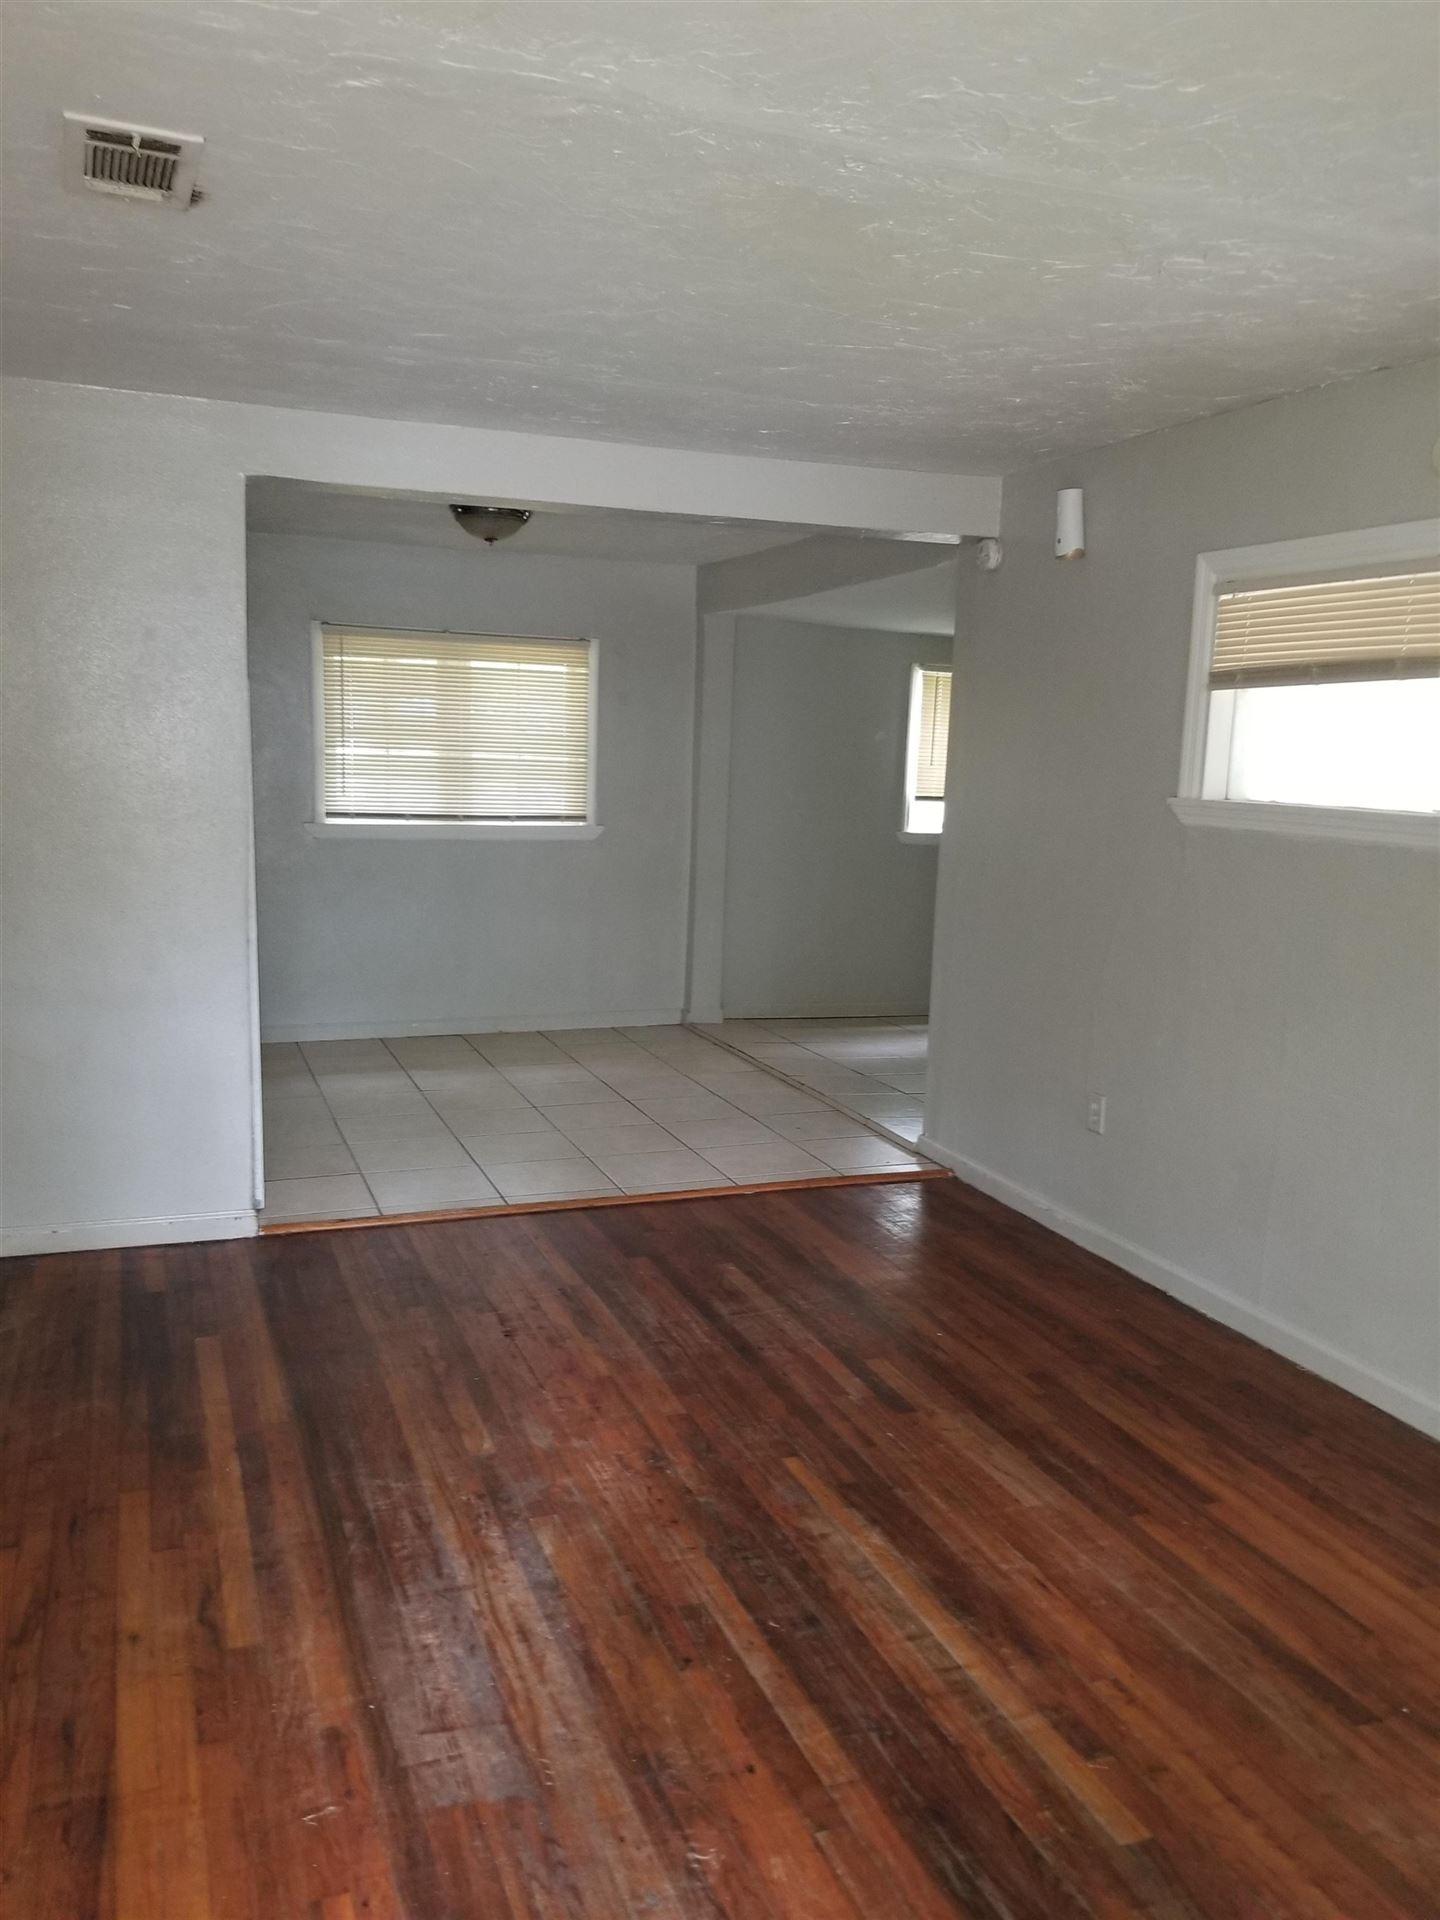 Photo of 500 Lynndale Street, TALLAHASSEE, FL 32301 (MLS # 337491)